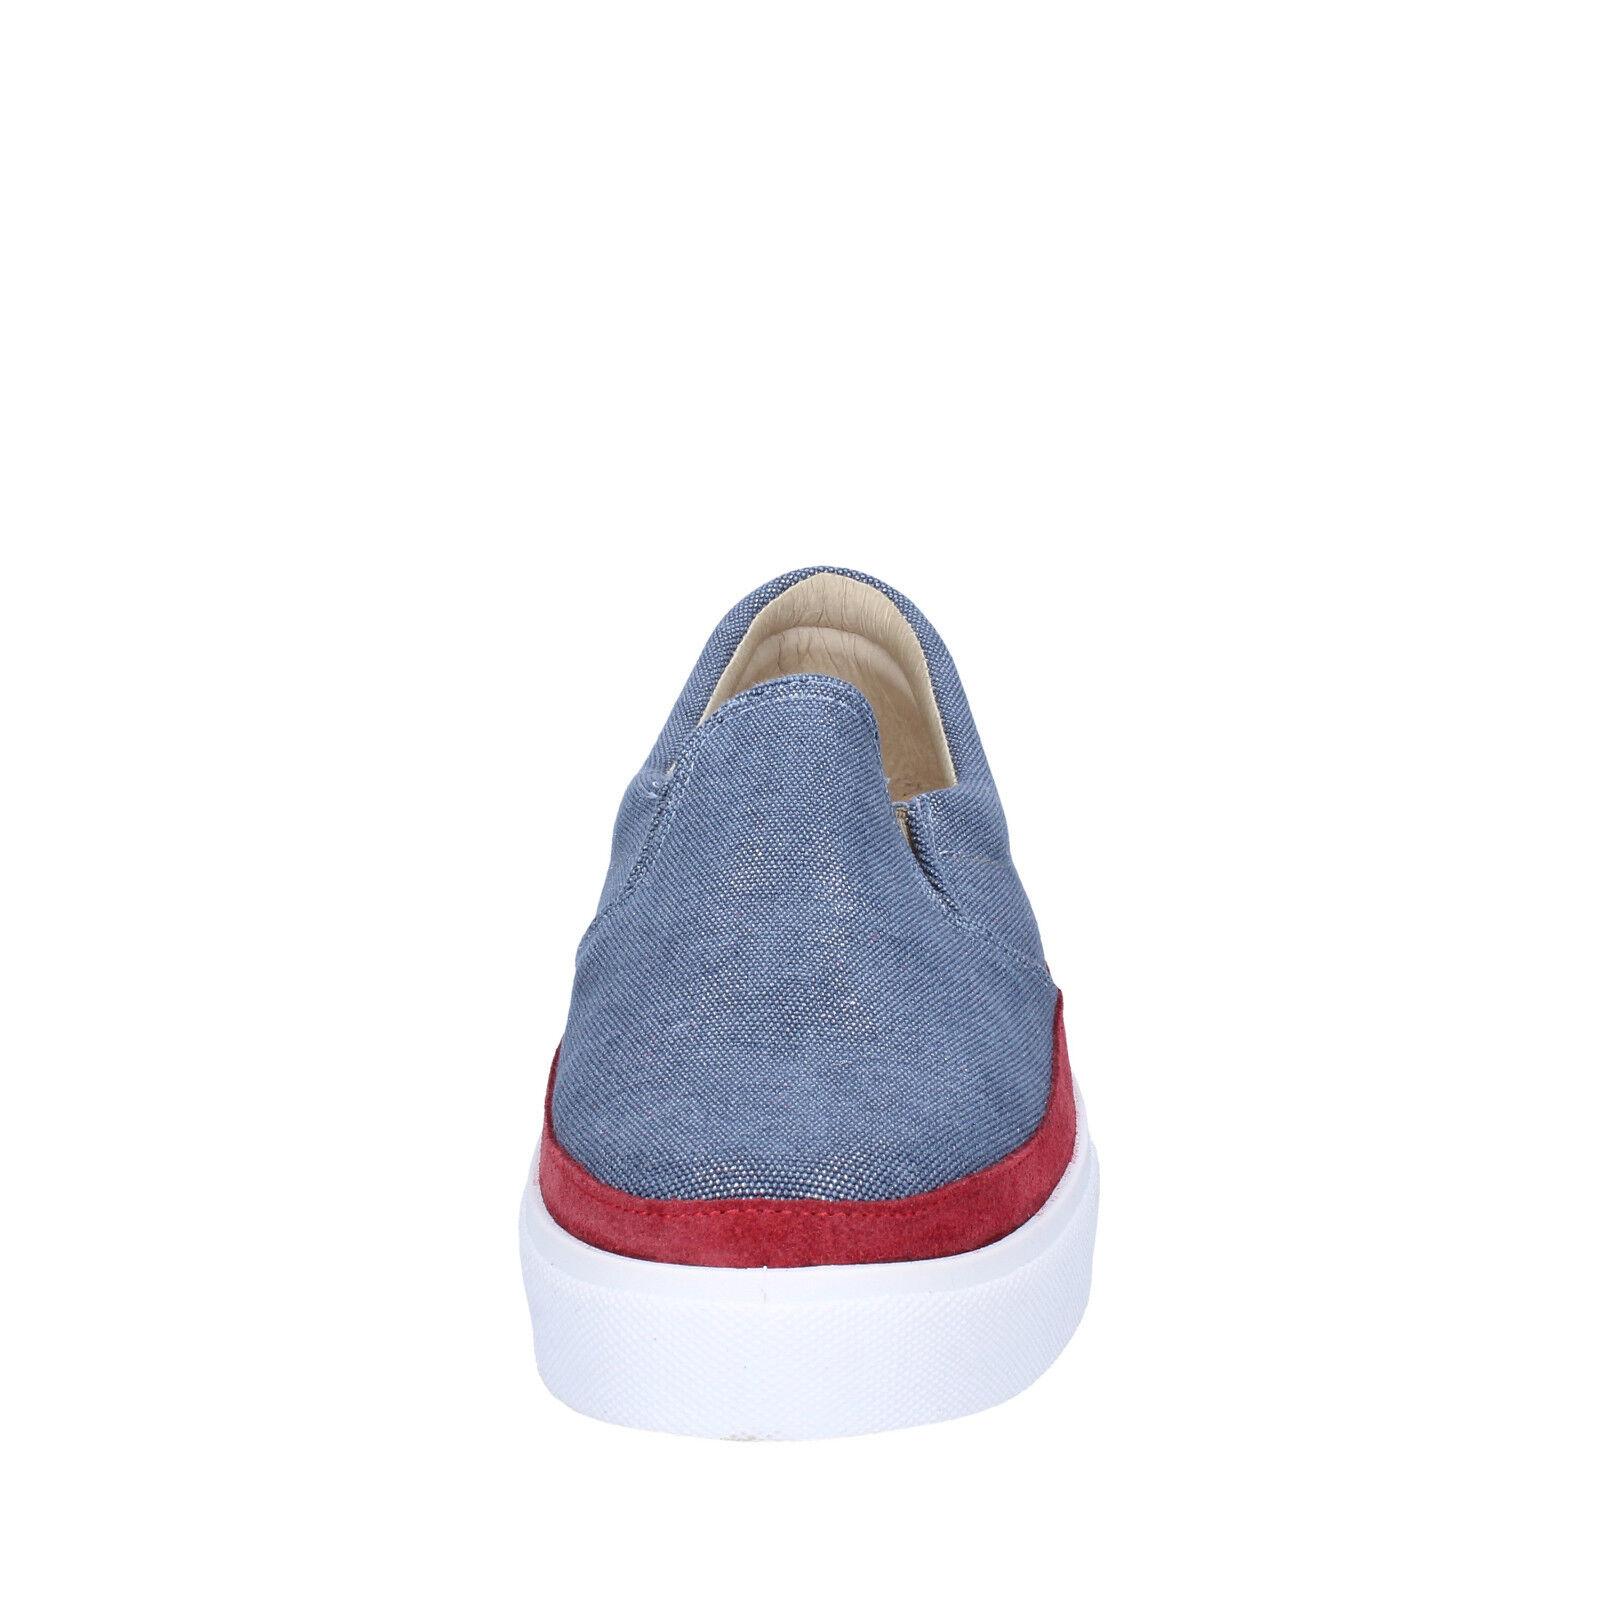 Damen schuhe 2 2 2 STAR  41 EU halbschuhe blau burgund wildleder AP715-C  | Professionelles Design  ef57de